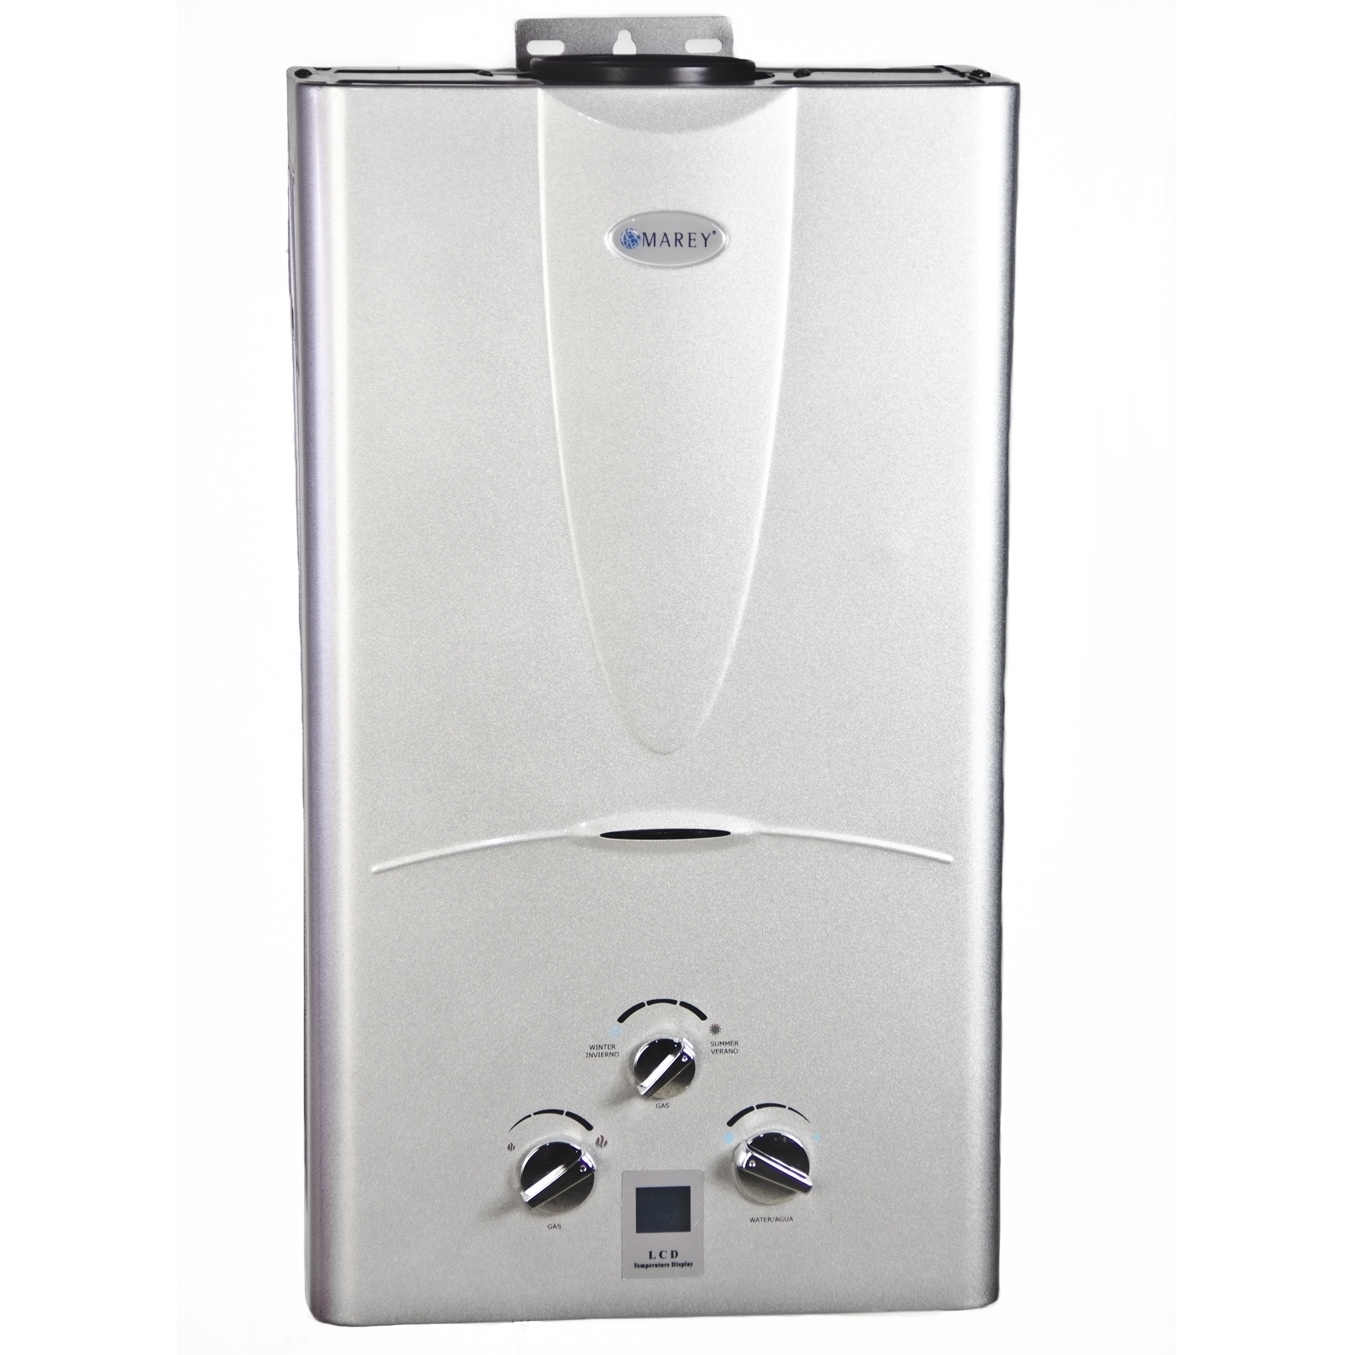 Marey Power Gas 10L Liquid Propane Tankless Water Heater ...